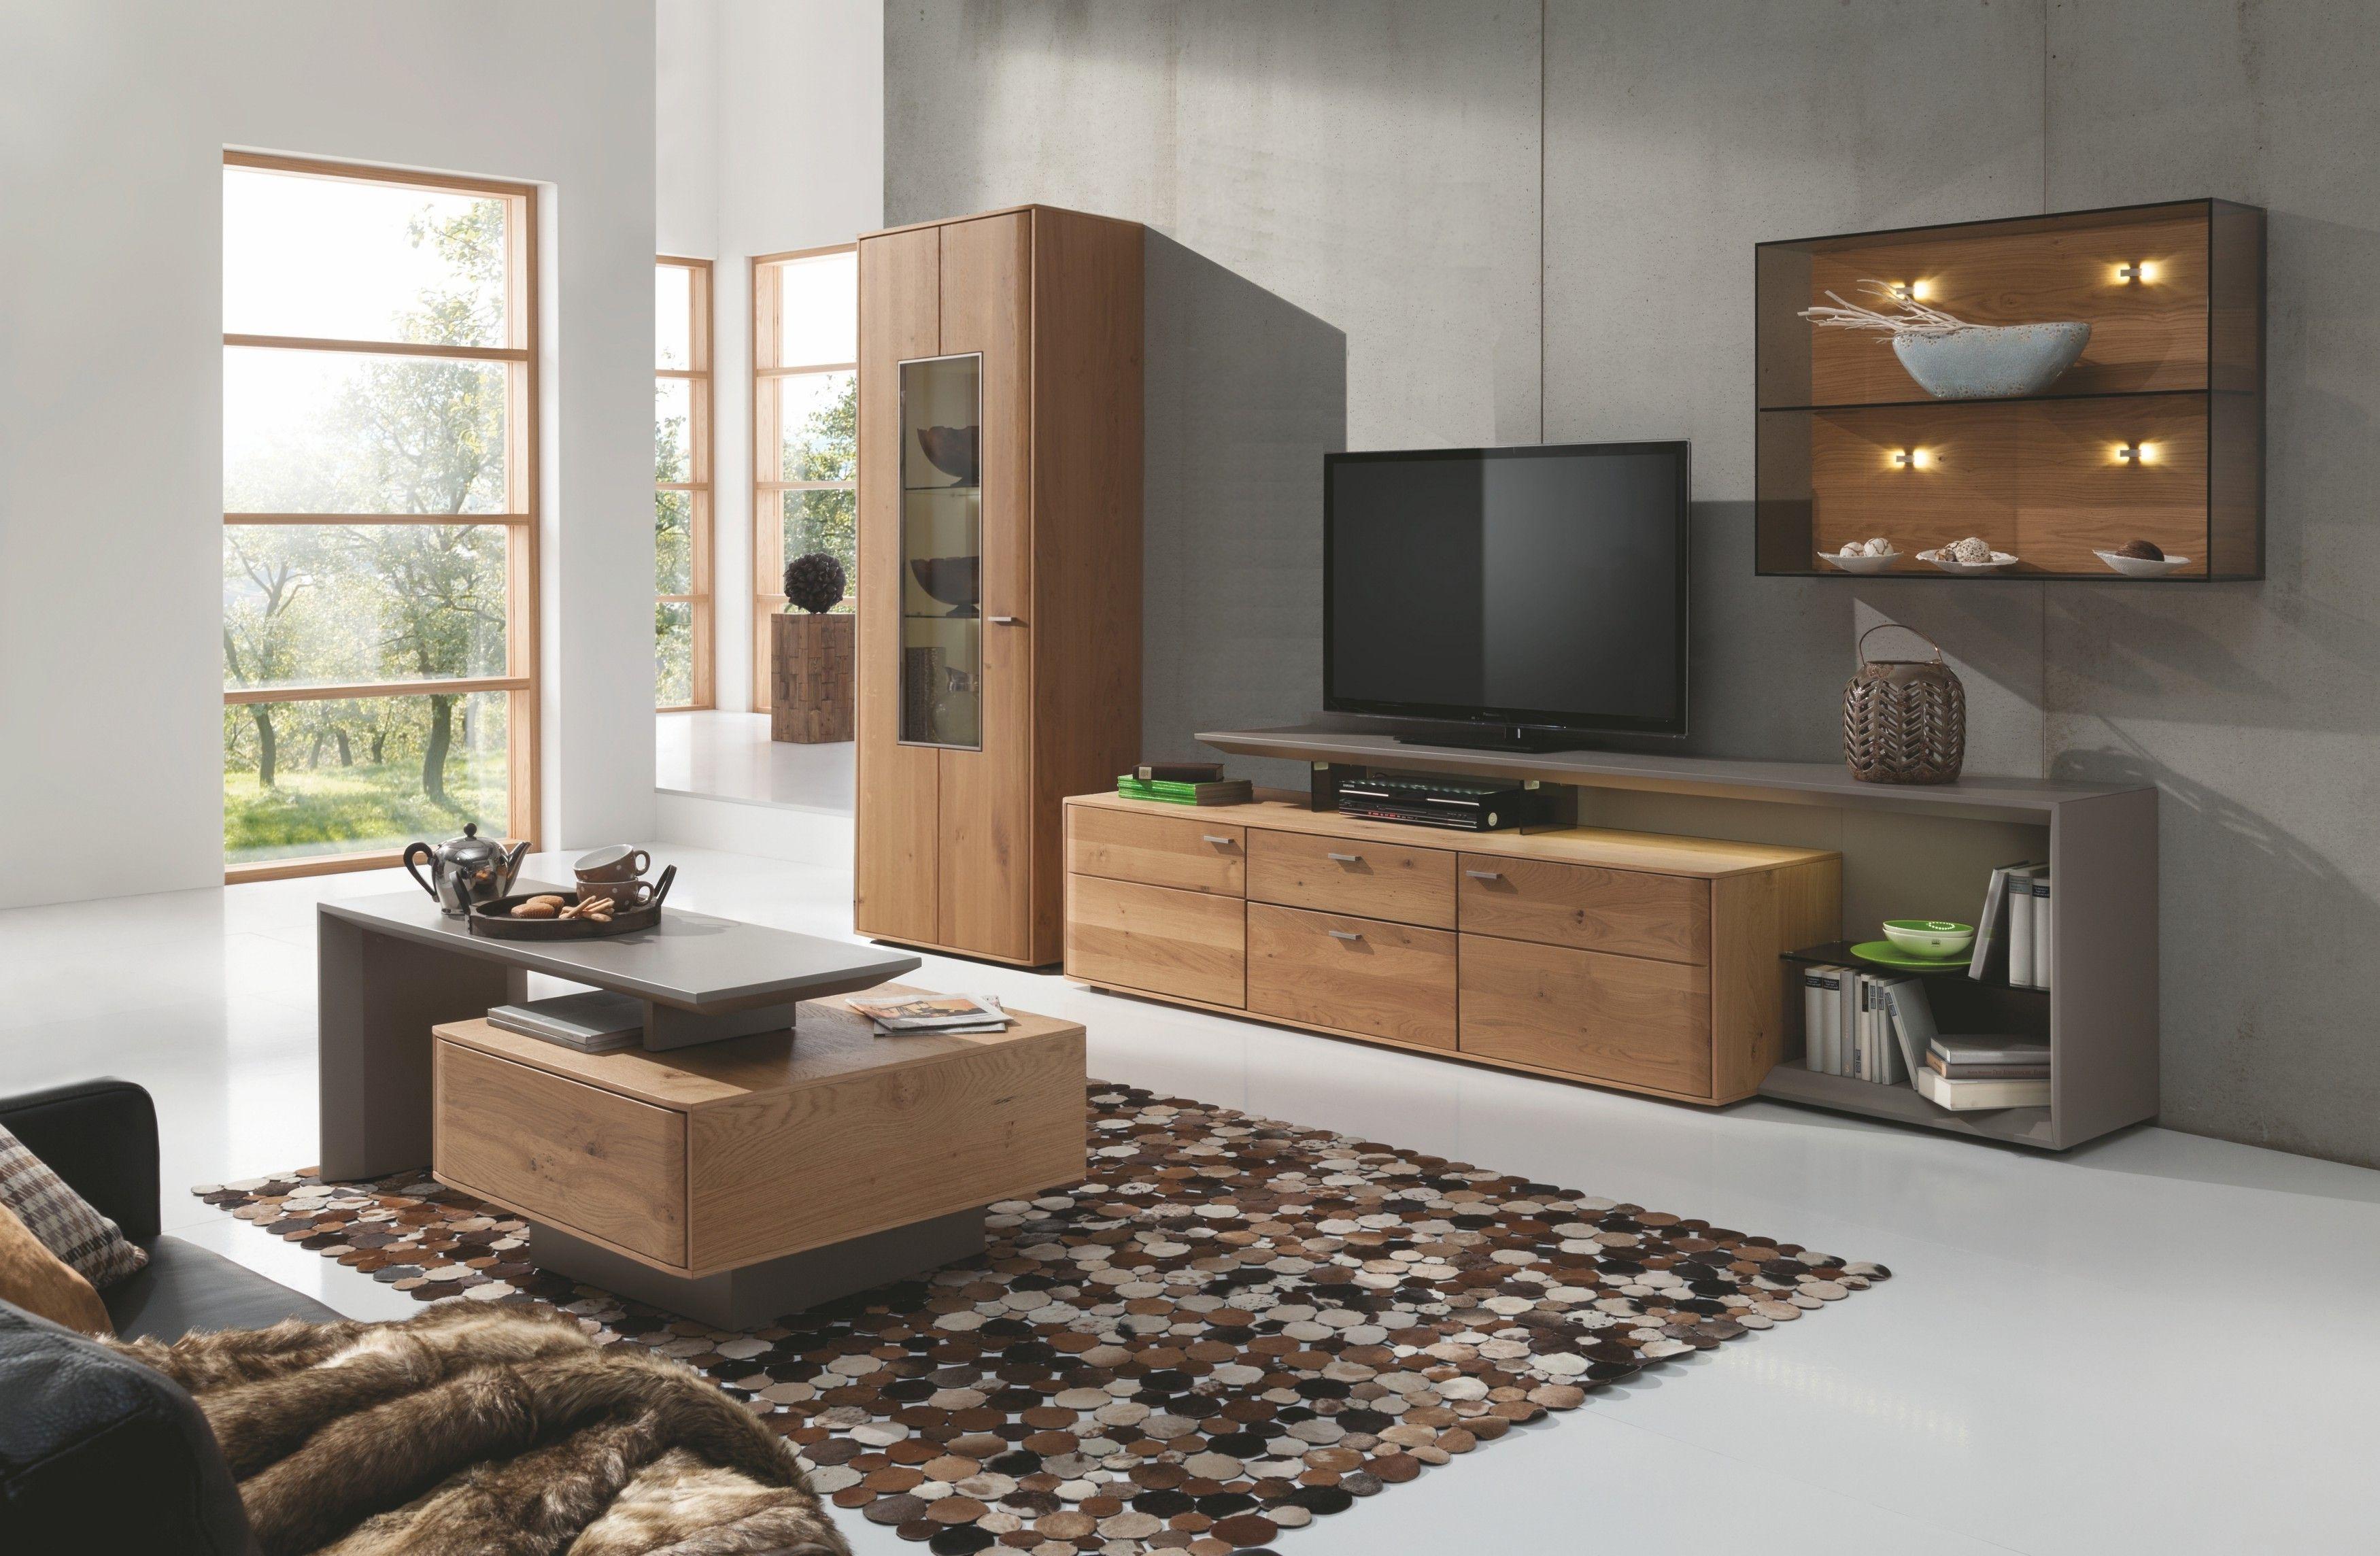 Wohnwand Wildeiche honig massiv/ fango seidenmatt lackiert Woody 165 00003   Online möbel, Woody ...